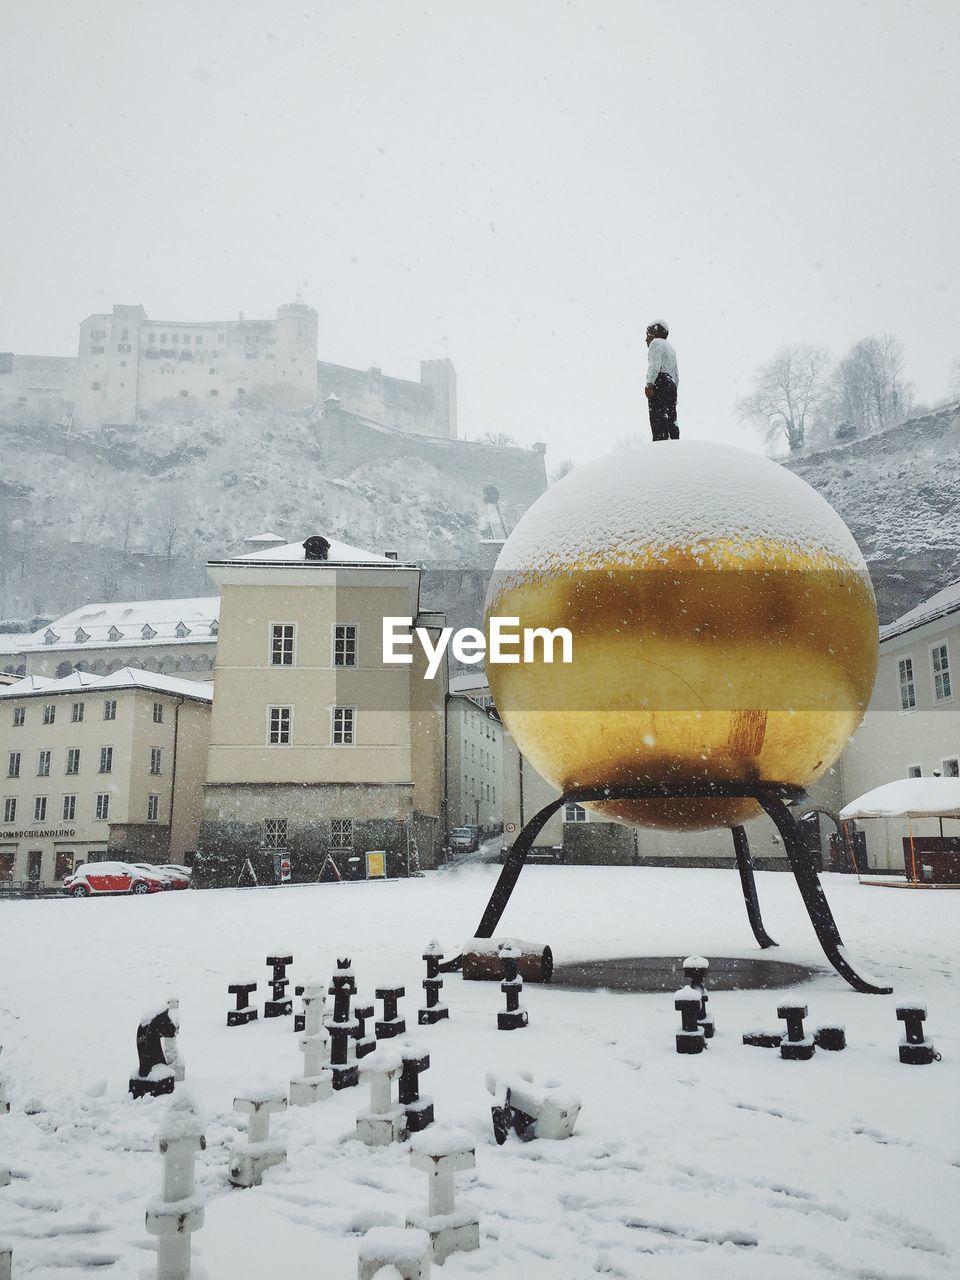 Sculpture of man on gilded sphere outside hohensalzburg castle